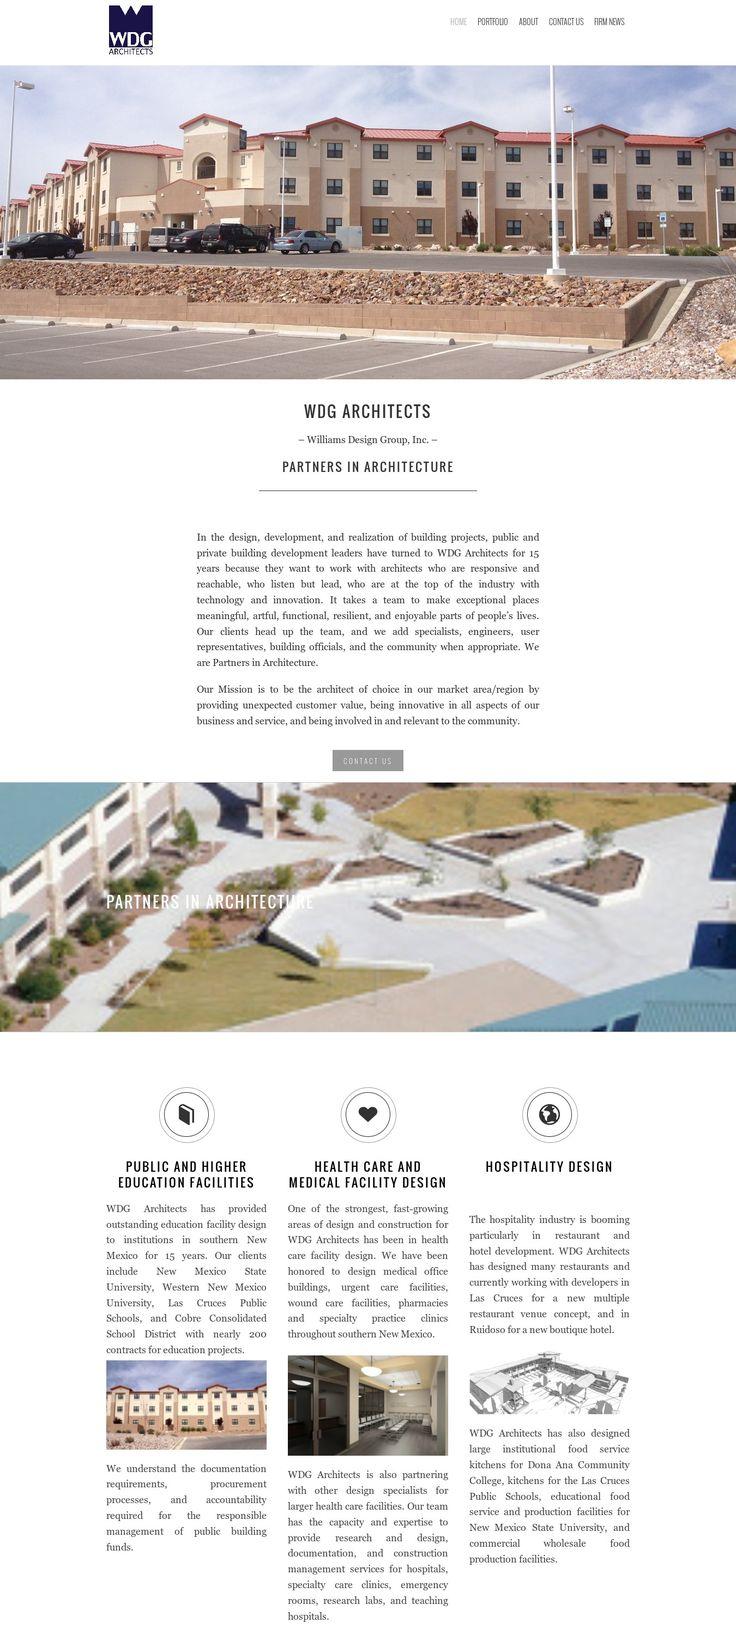 WordPress site wdg-architects.com uses the Architect Marketing Group Template 1 best wordpress theme